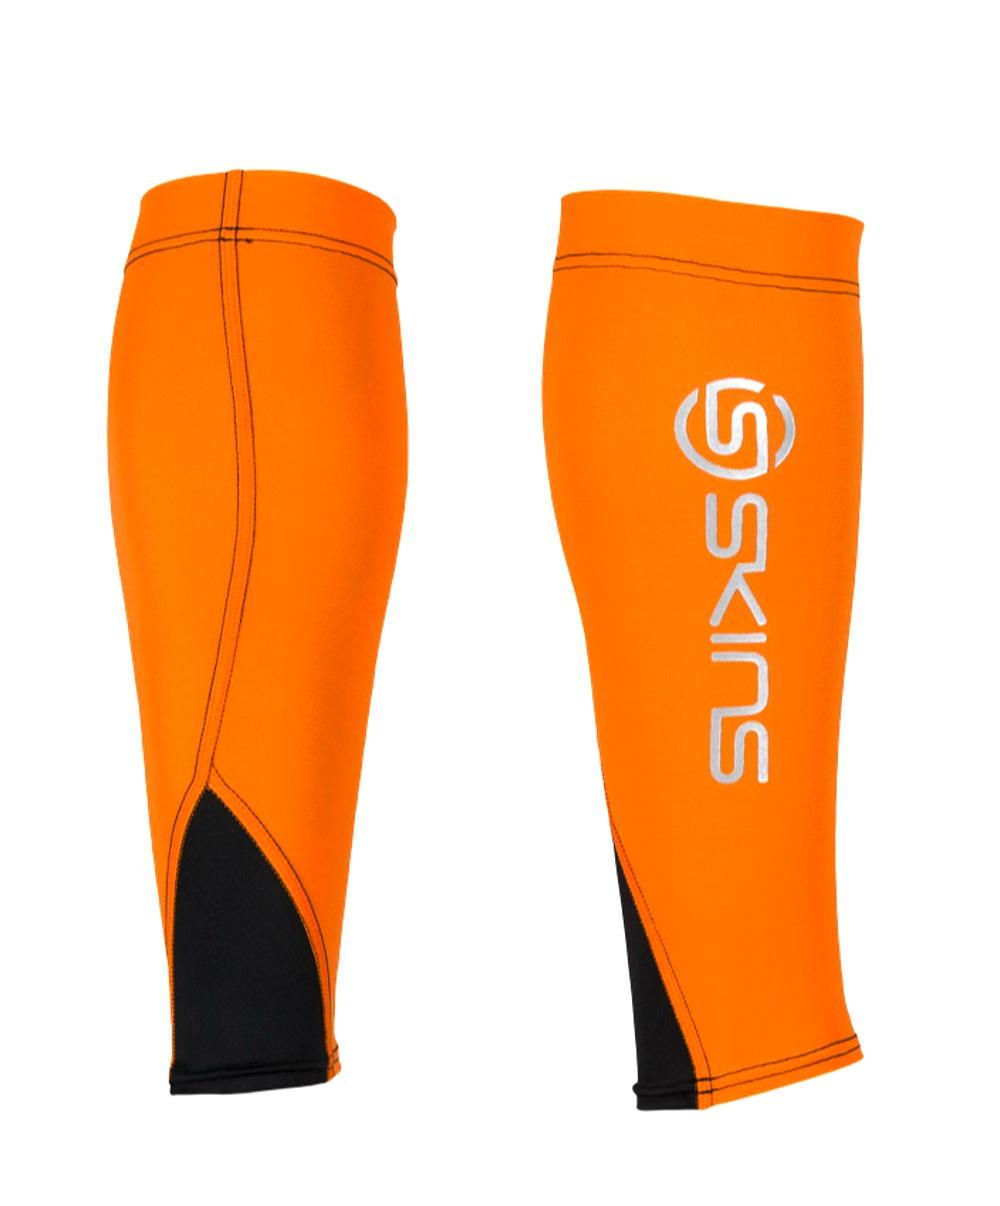 skins manchon de compression bio essentials orange black. Black Bedroom Furniture Sets. Home Design Ideas